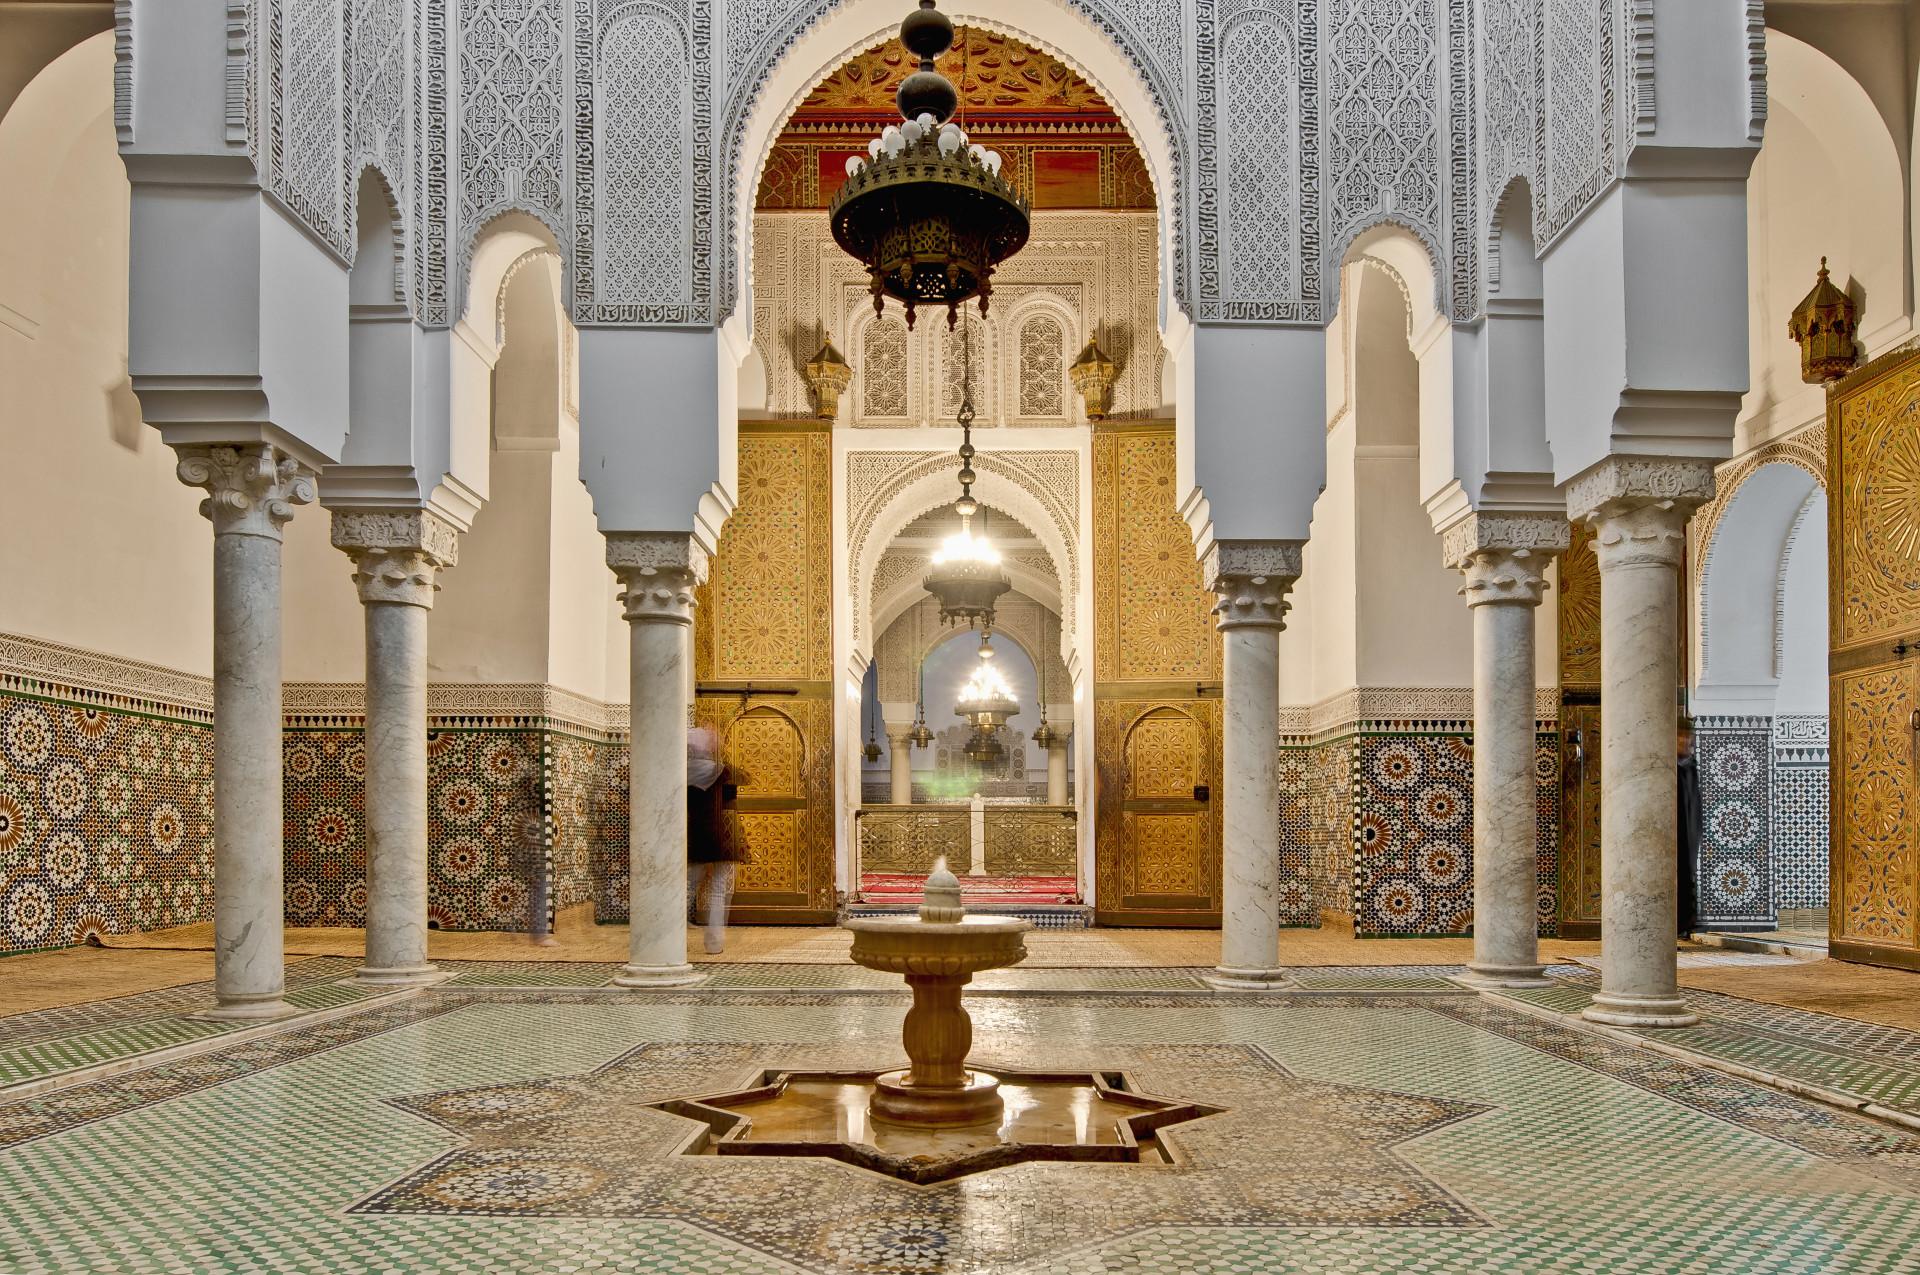 Moulay Ismail Mausoleum interior, Meknes, Marokko